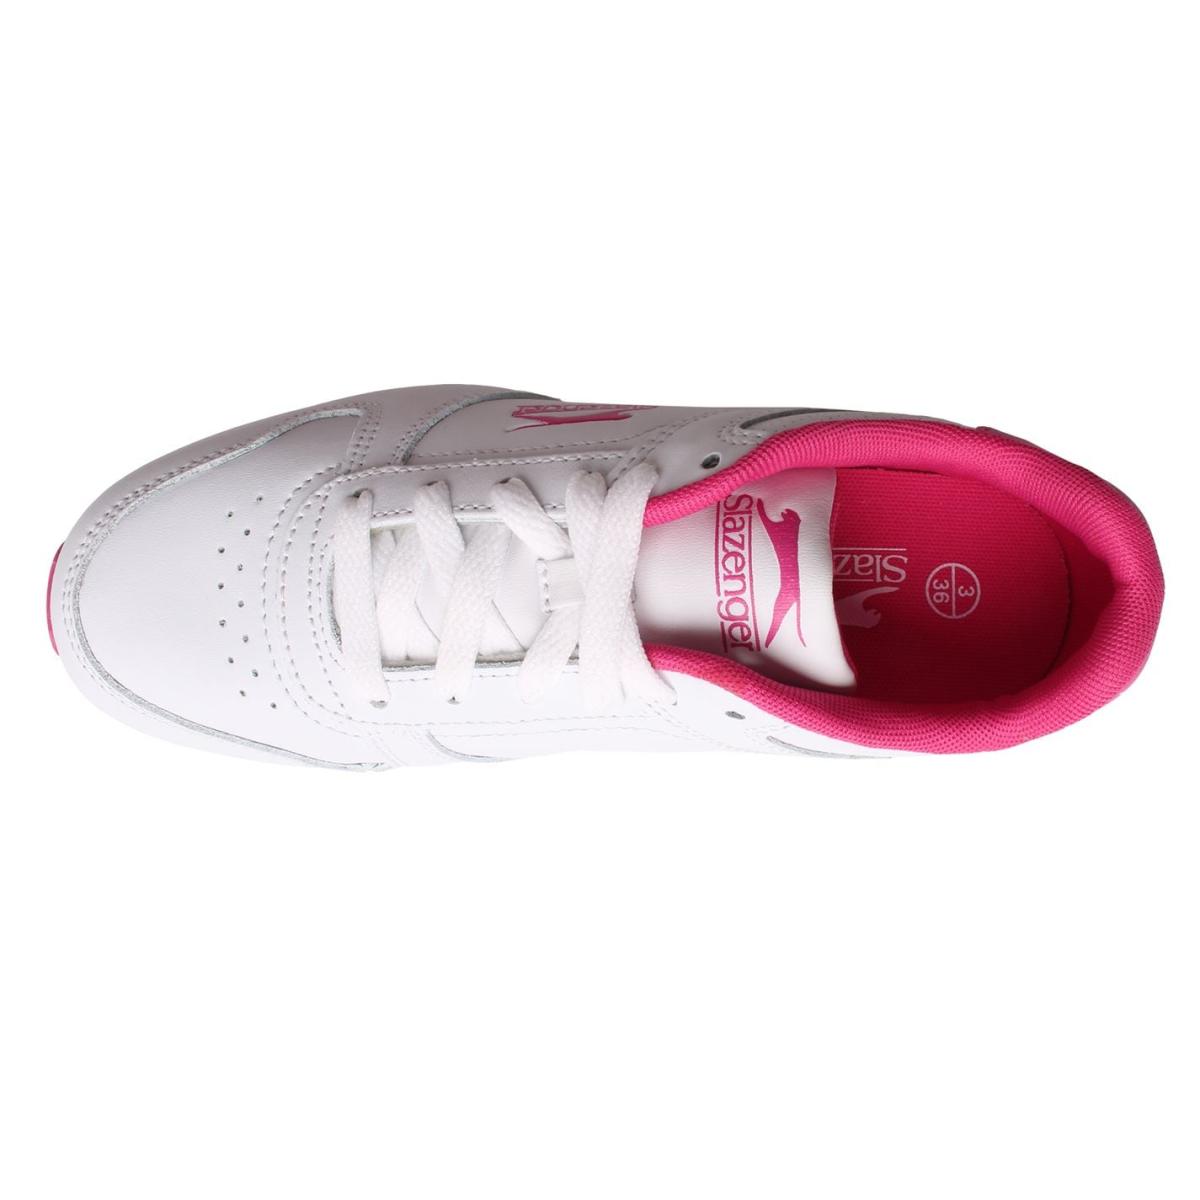 Slazenger-Classic-Turnschuhe-Laufschuhe-Damen-Sportschuhe-Sneaker-1265 Indexbild 10